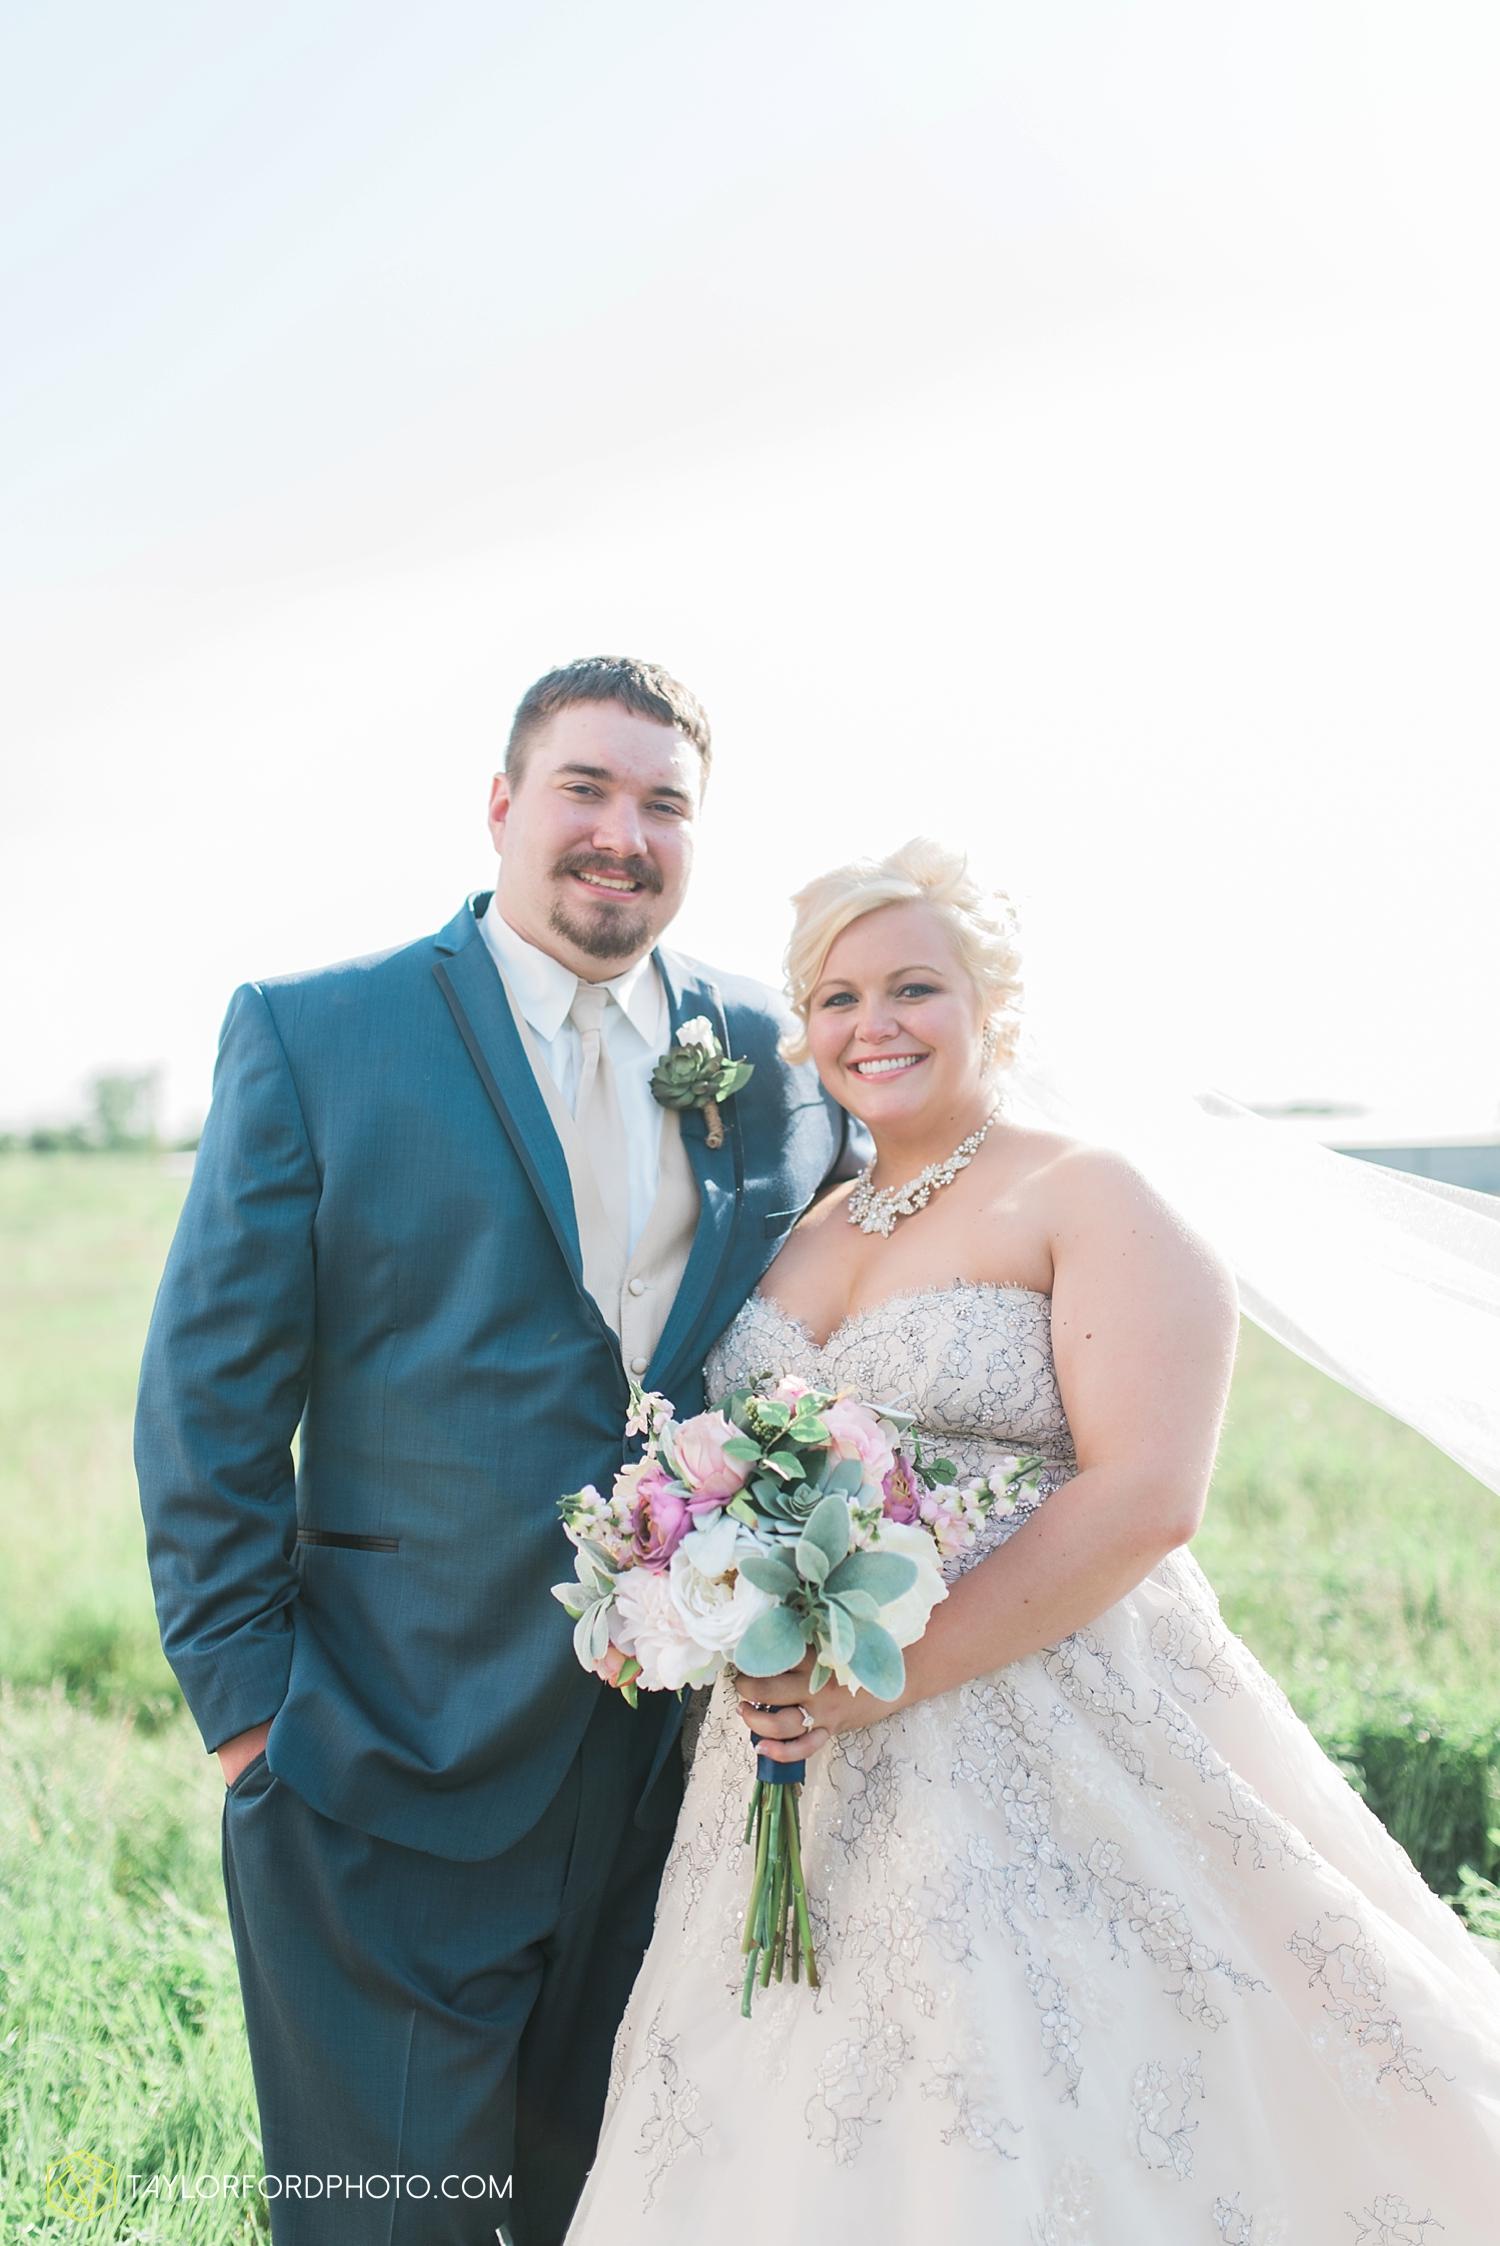 van_wert_ohio_wedding_photographer_taylor_ford_1292.jpg